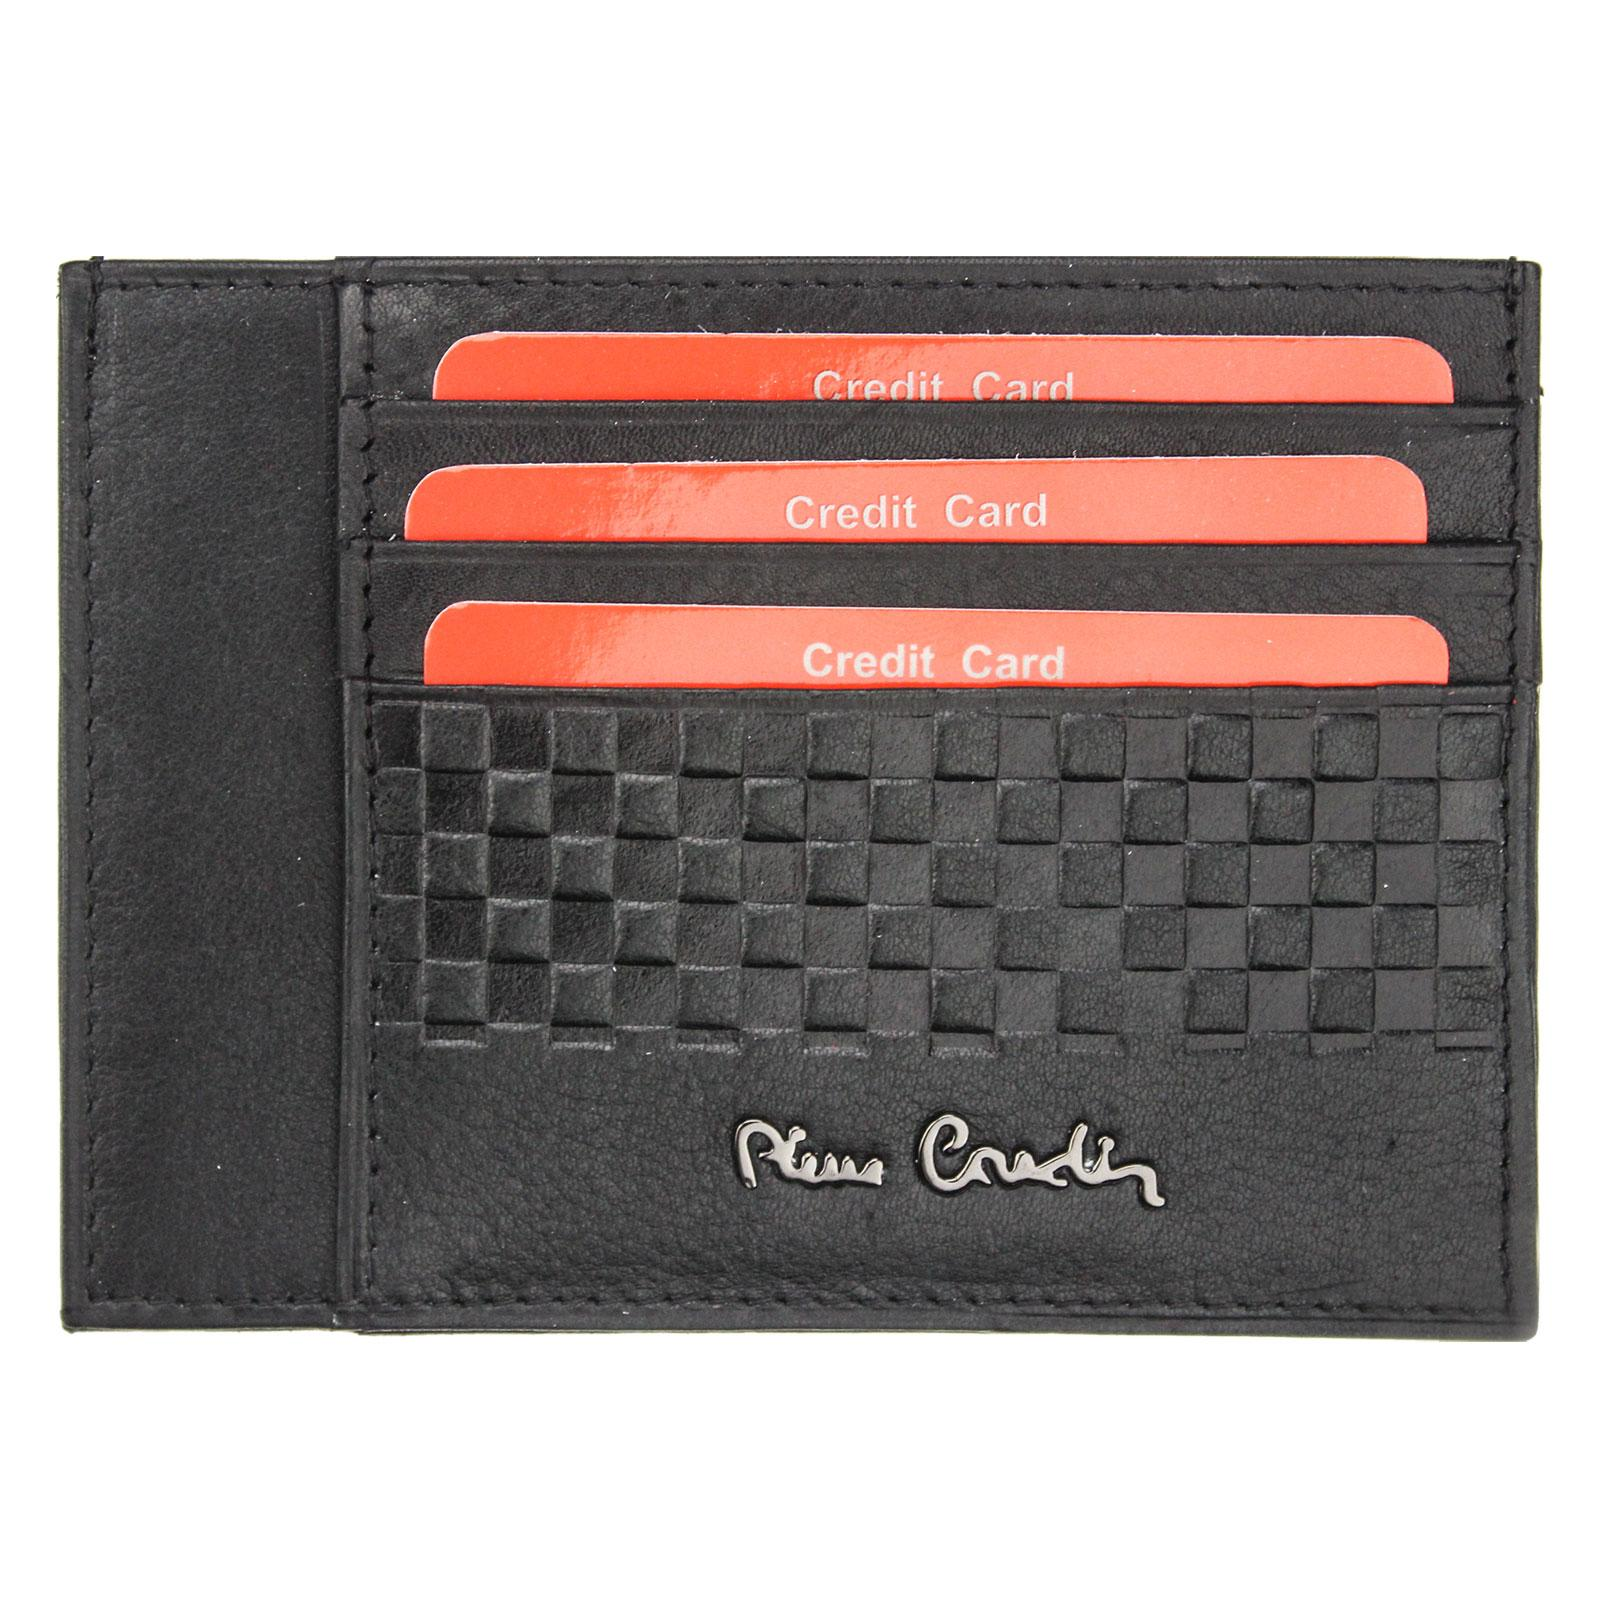 Puzdro na kreditné karty Pierre Cardin TILAK39 P020